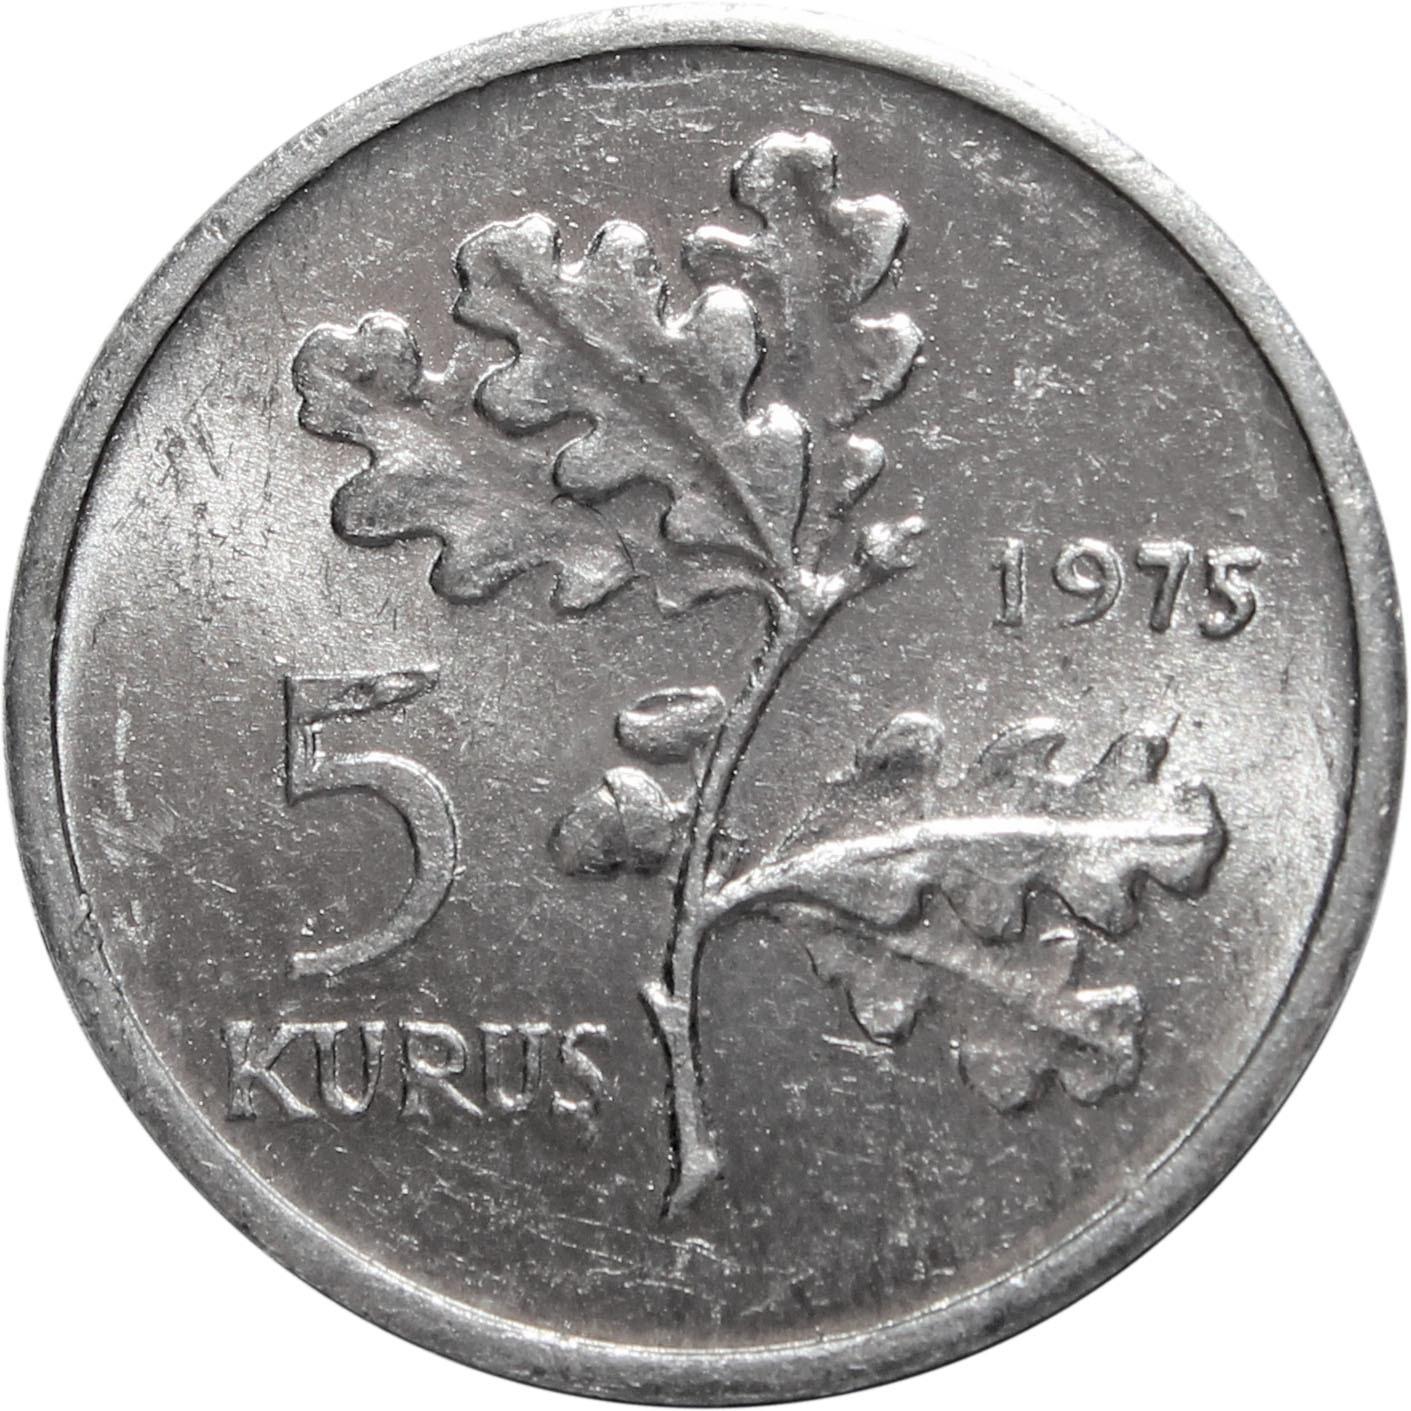 5 курушей. Турция. 1975 год. UNC